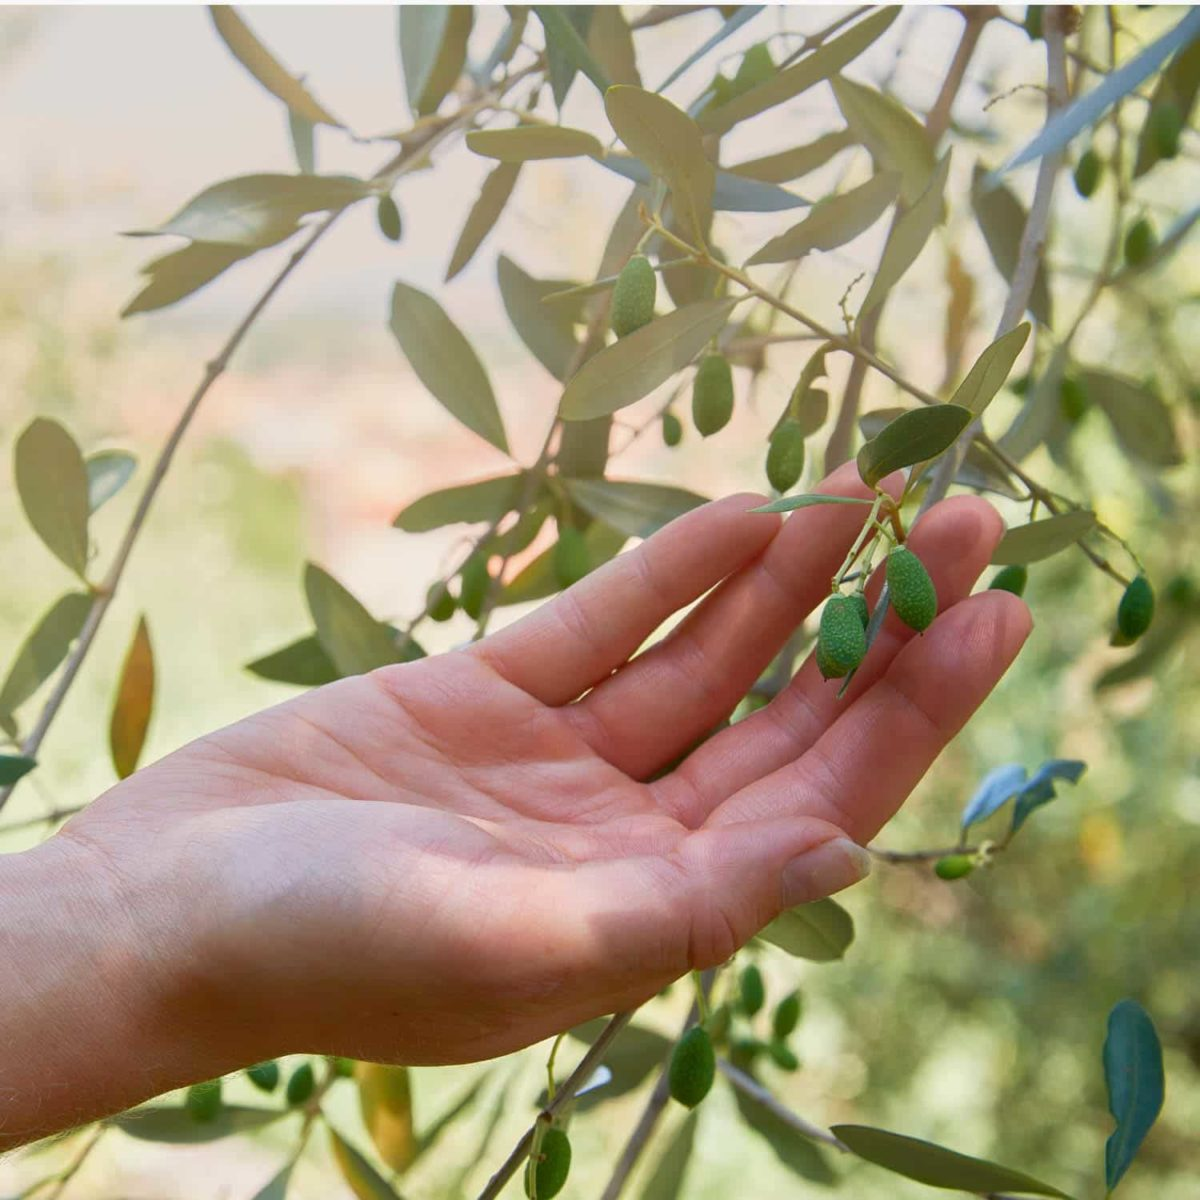 Casida Squalan Öl Haut & Haare – 30 ml 16852202 PZN Apotheke Ölive Massage trockene Haut pflegen natürlich Beauty3